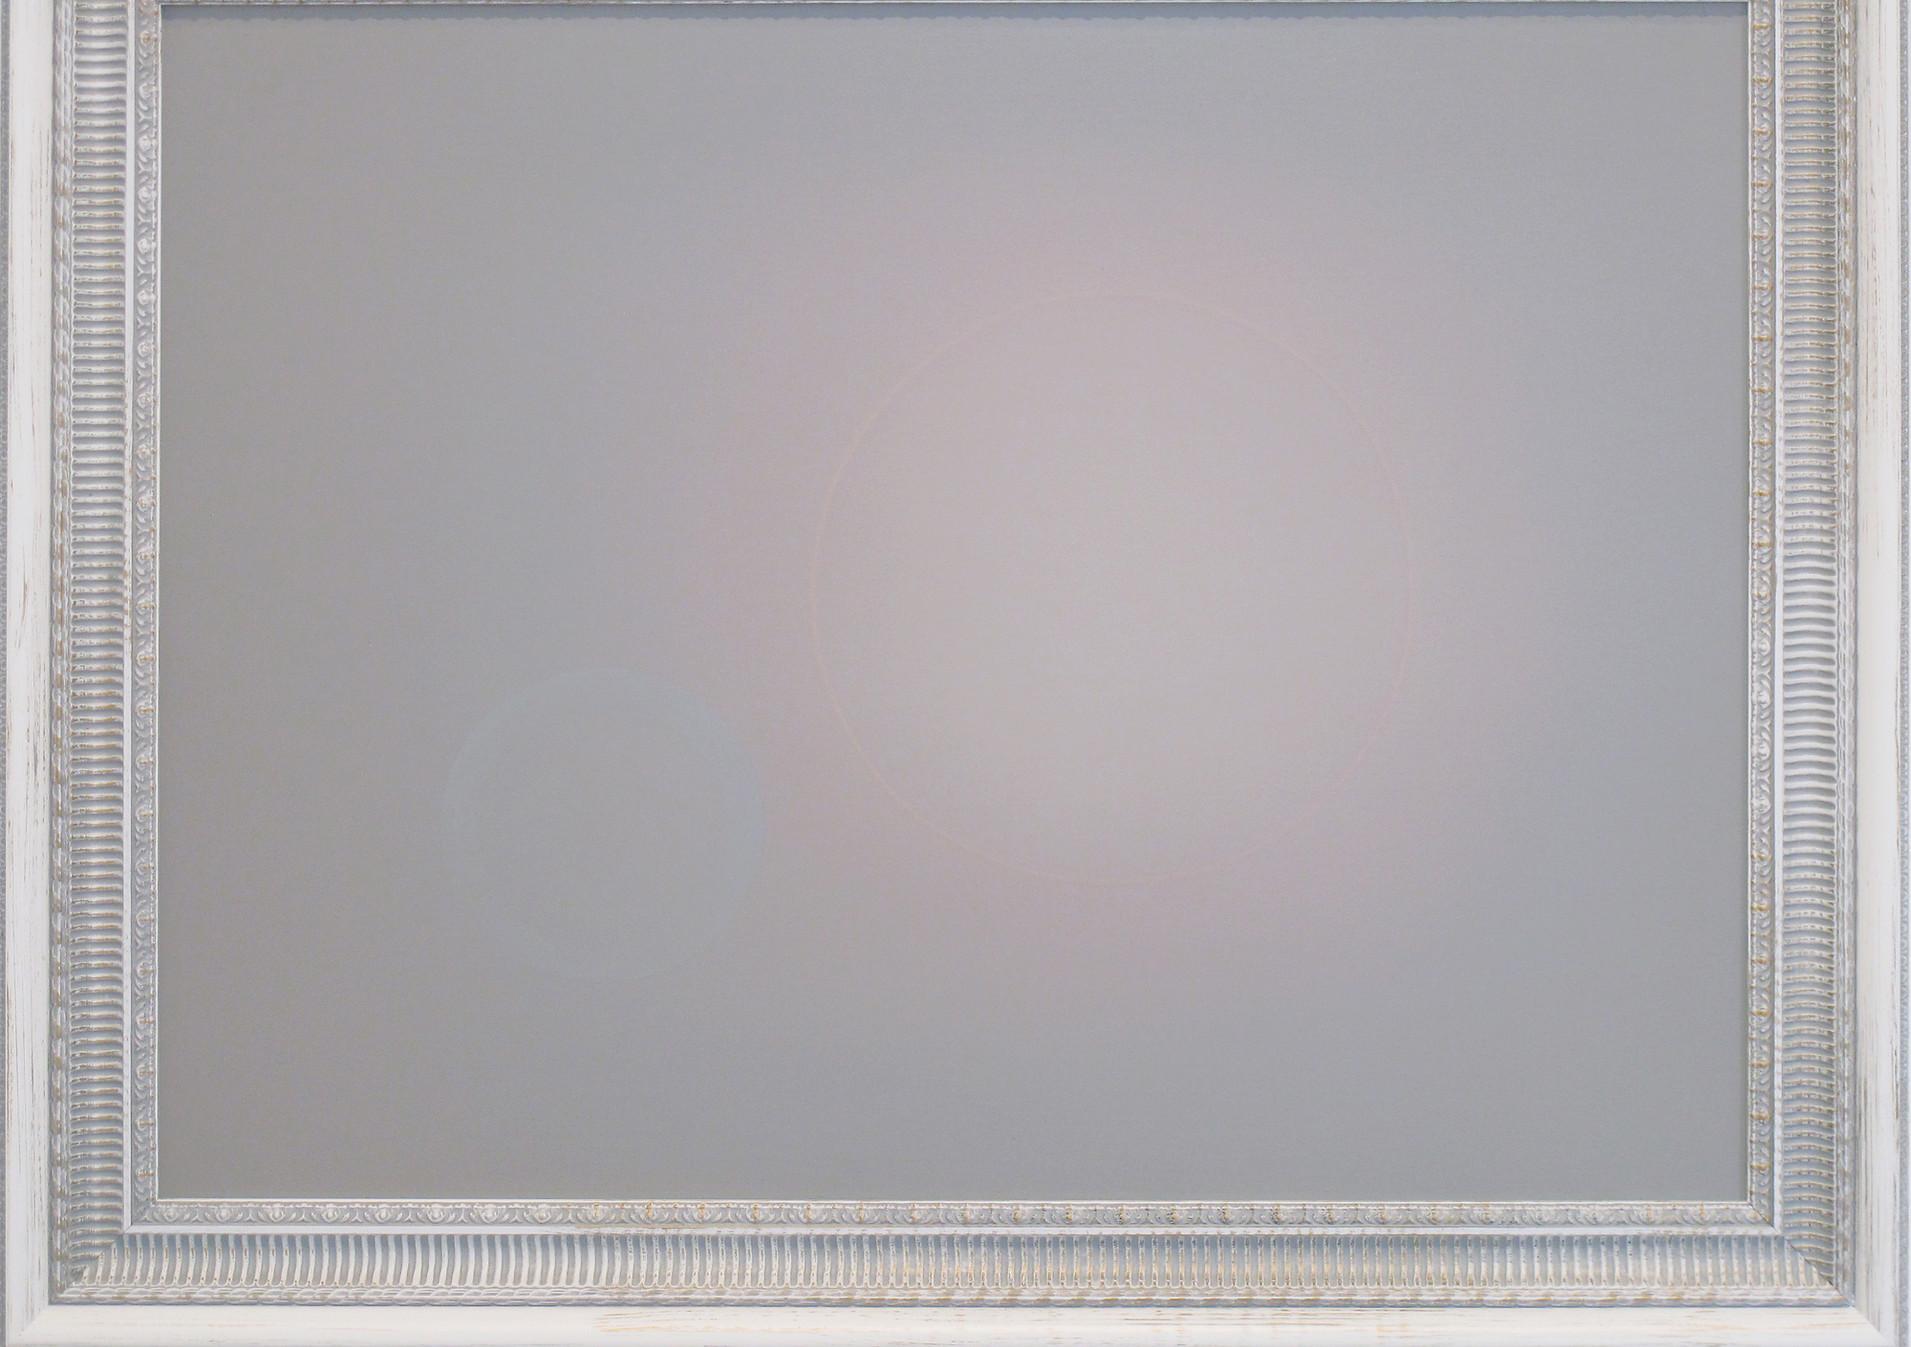 måleri2 nätet.jpg